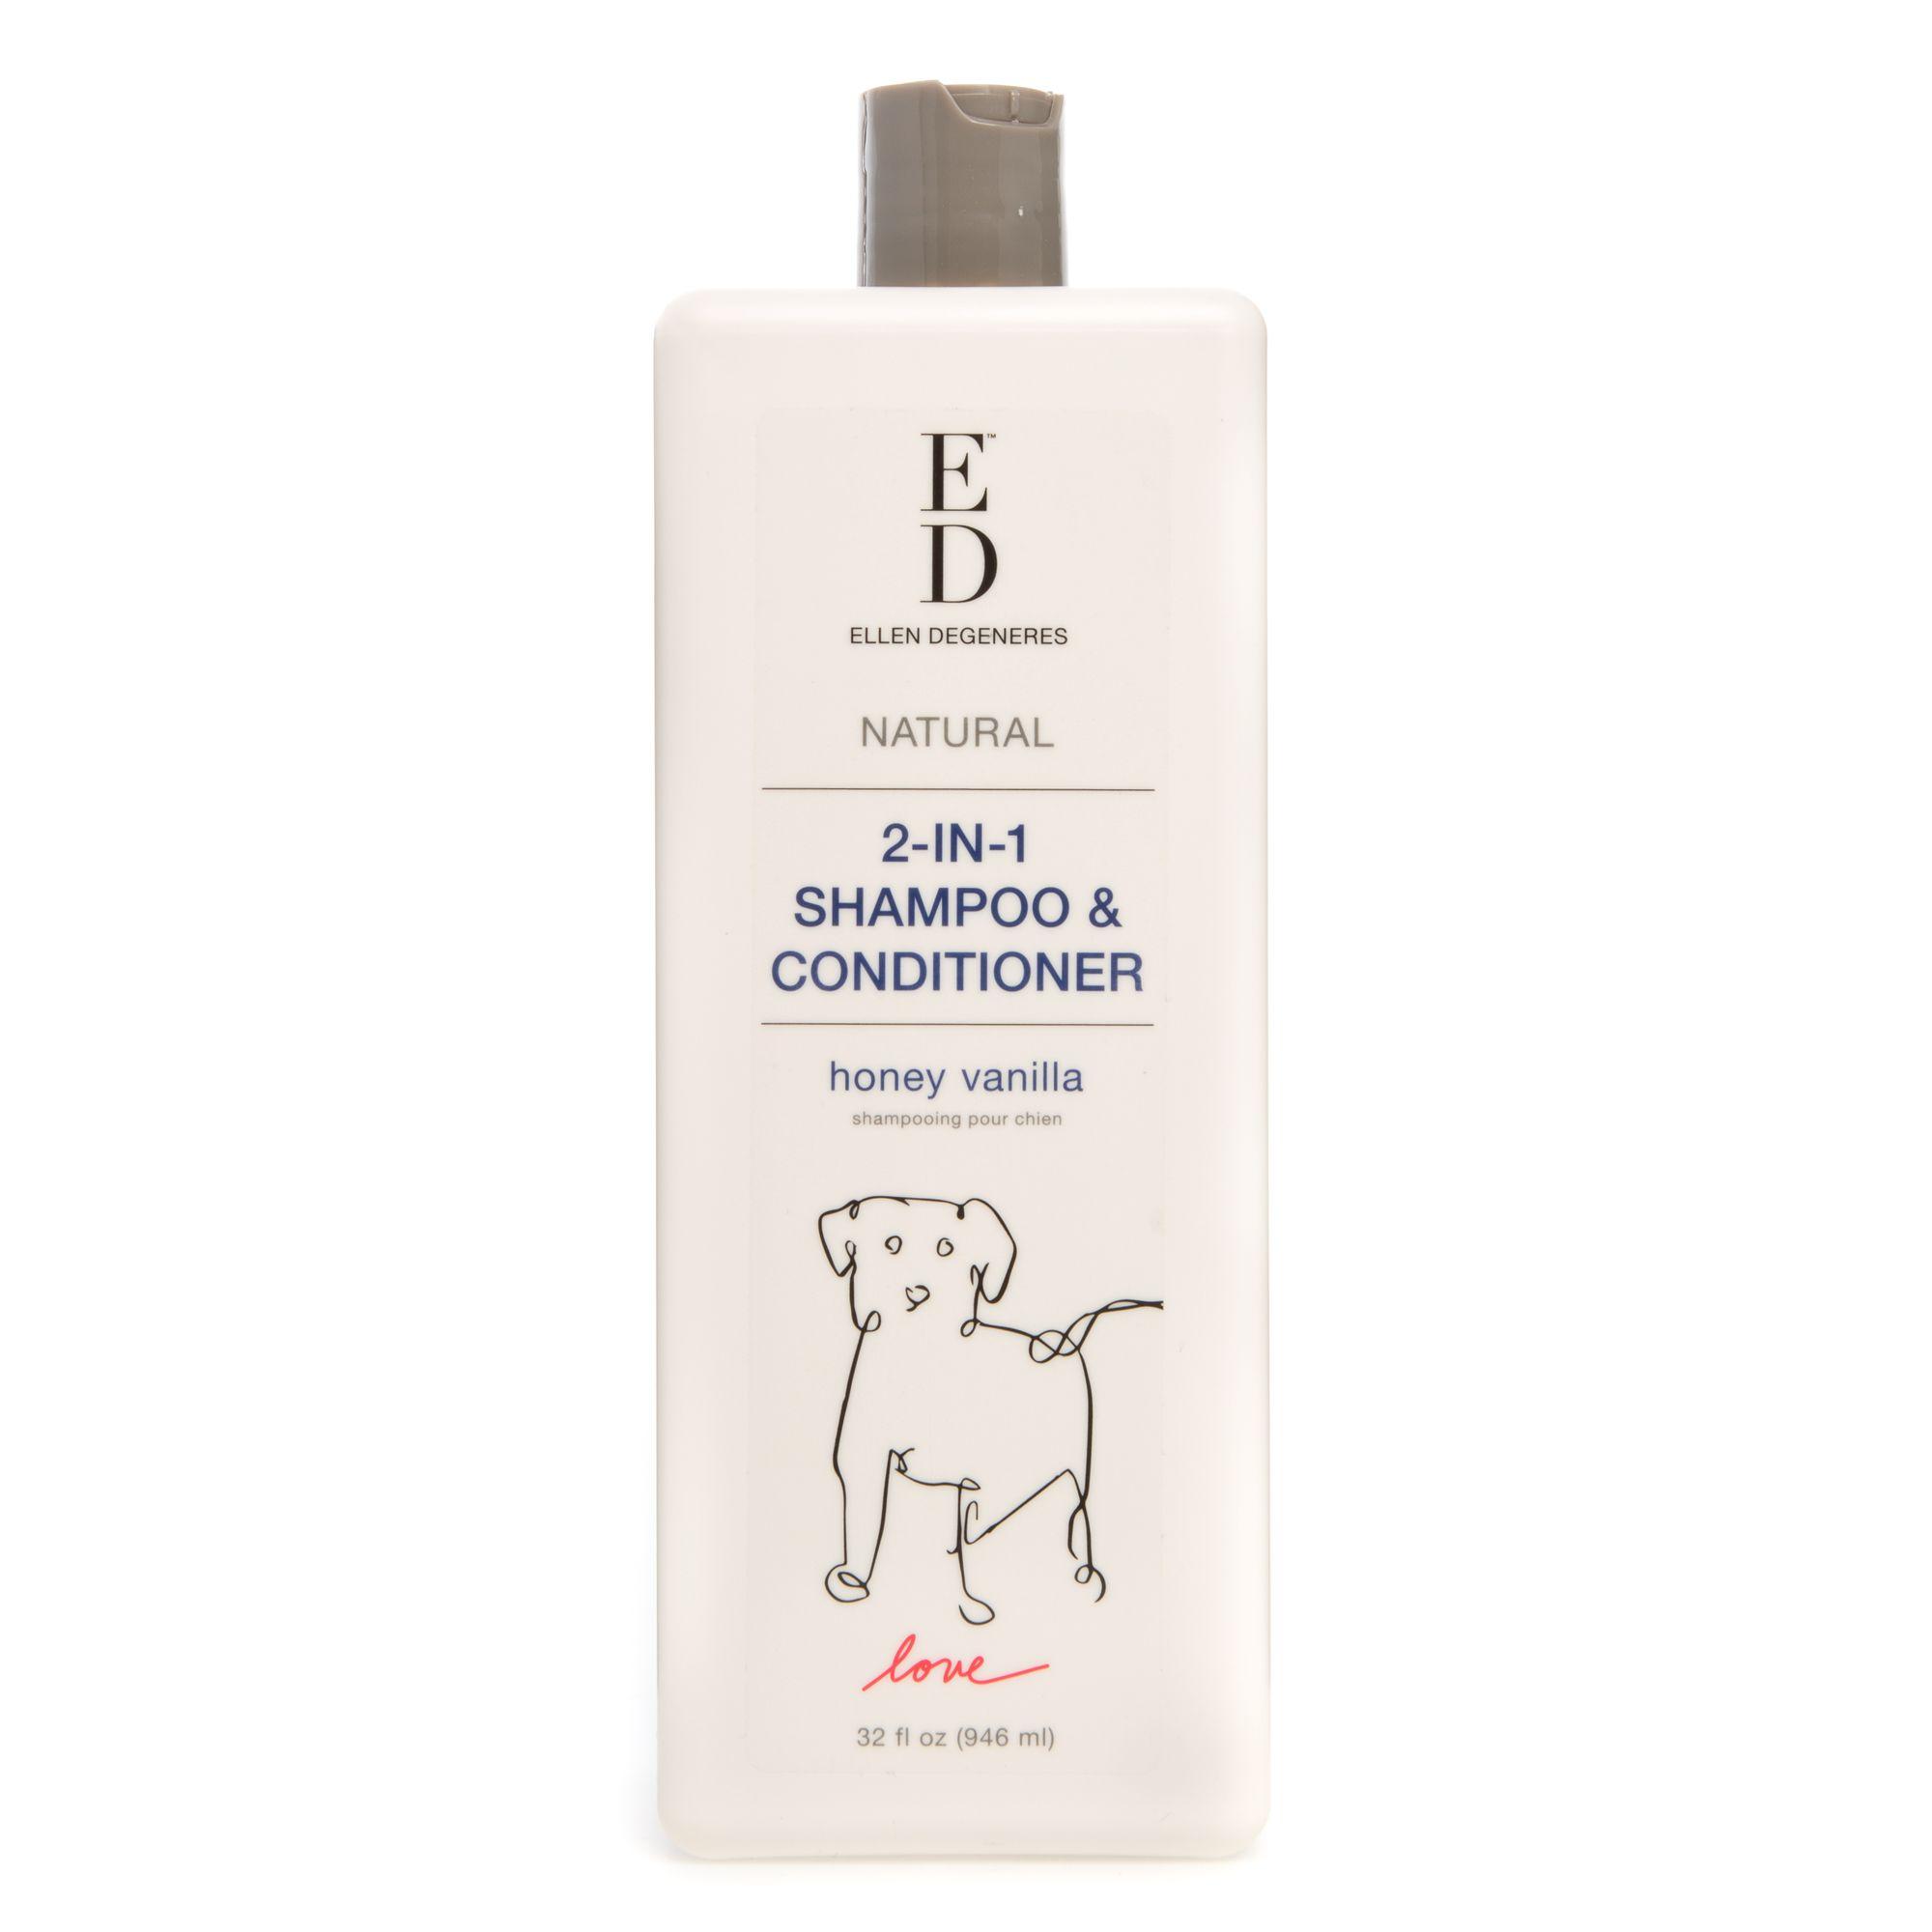 Ed Ellen Degeneres 2 In 1 Dog Shampoo And Conditioner Size 32 Fl Oz